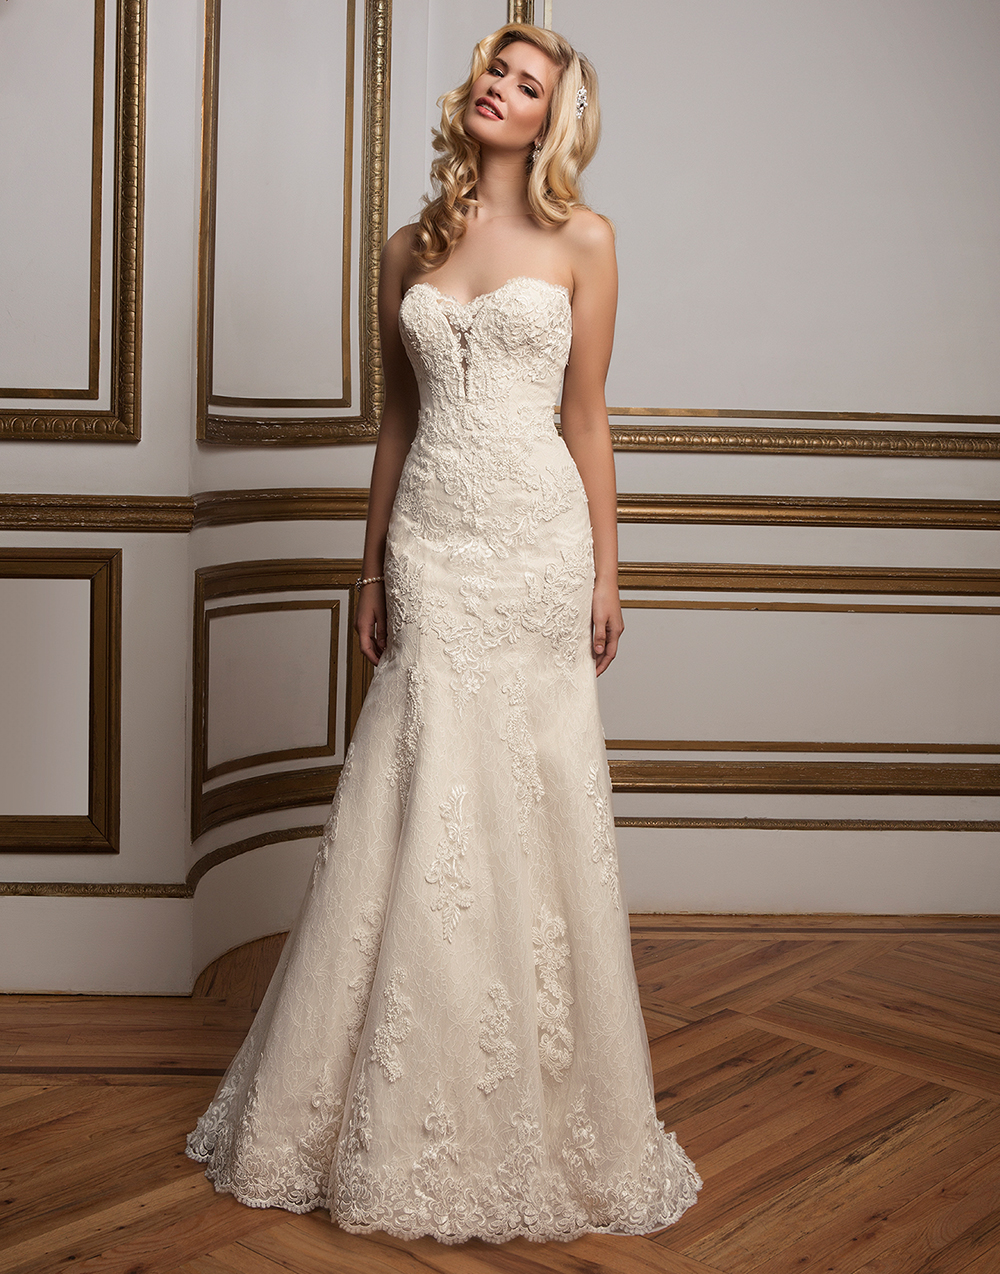 51cfebb1bb2 Bridal Gallery — Simply Stunning by Divas